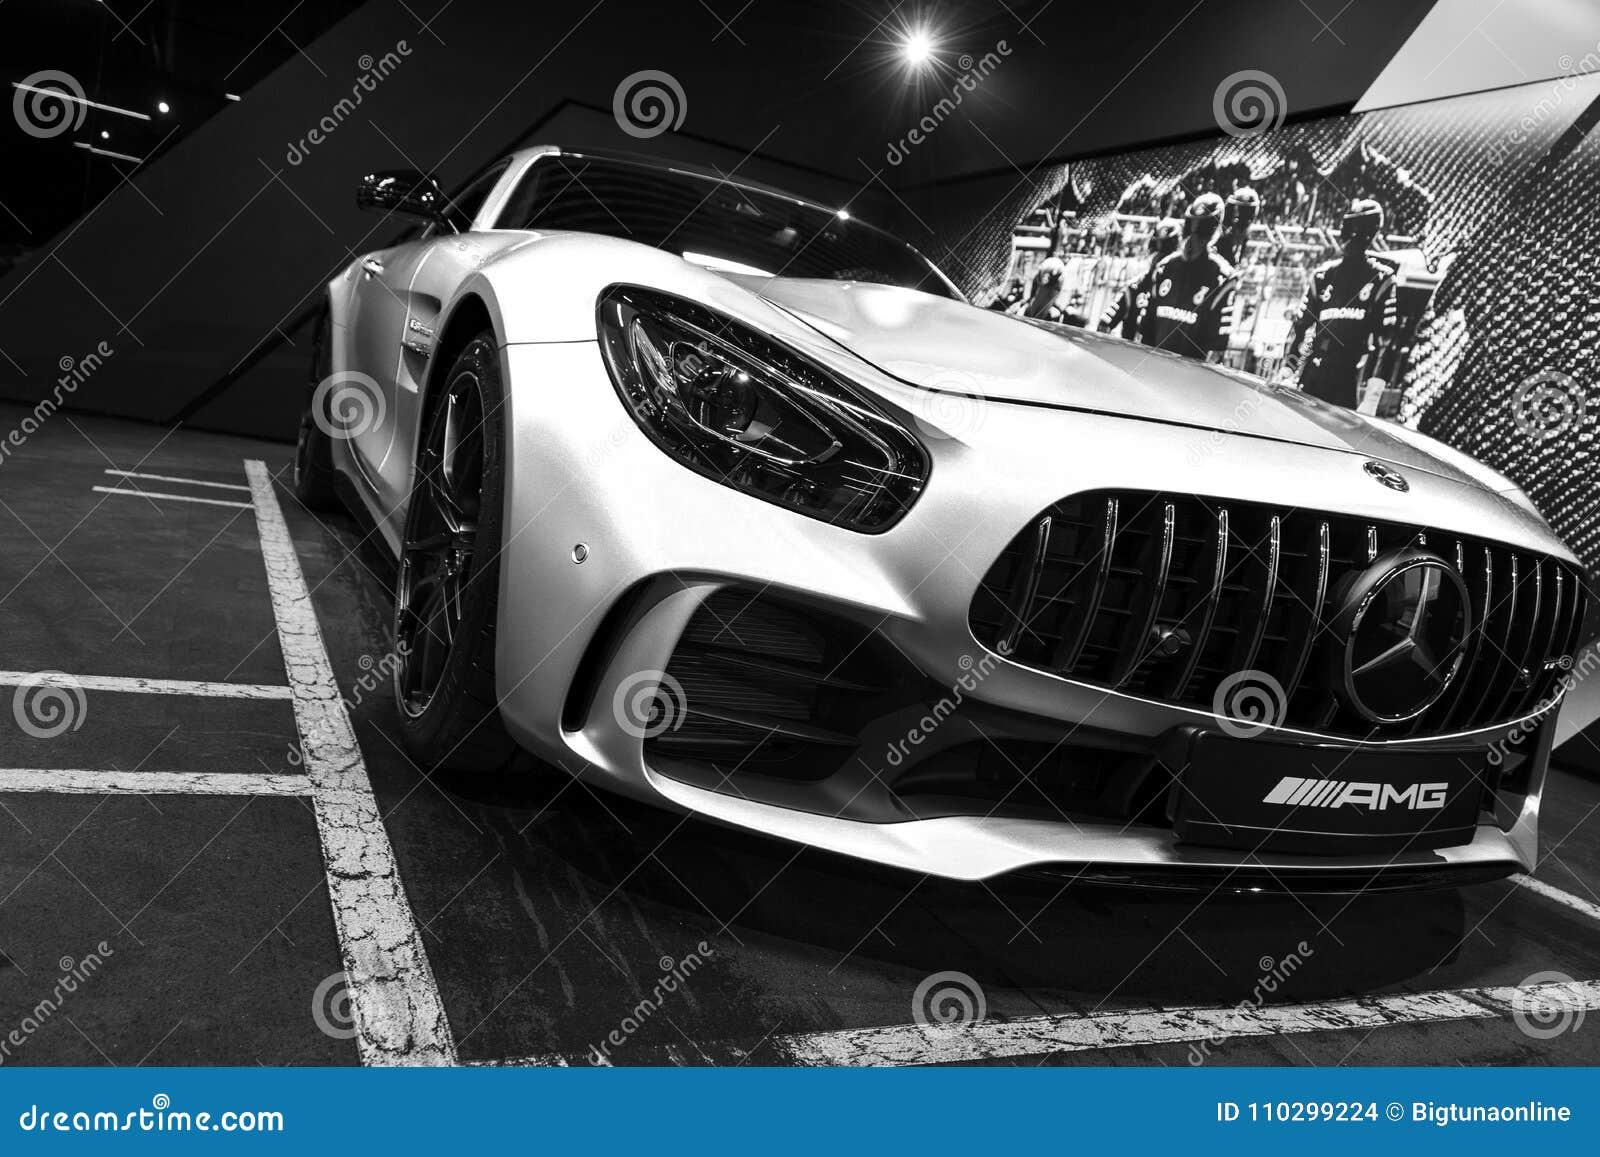 Mercedes-Benz AMG GTR 2018 V8 de buitendetails van Biturbo, Koplamp Front View Auto buitendetails Rebecca 36